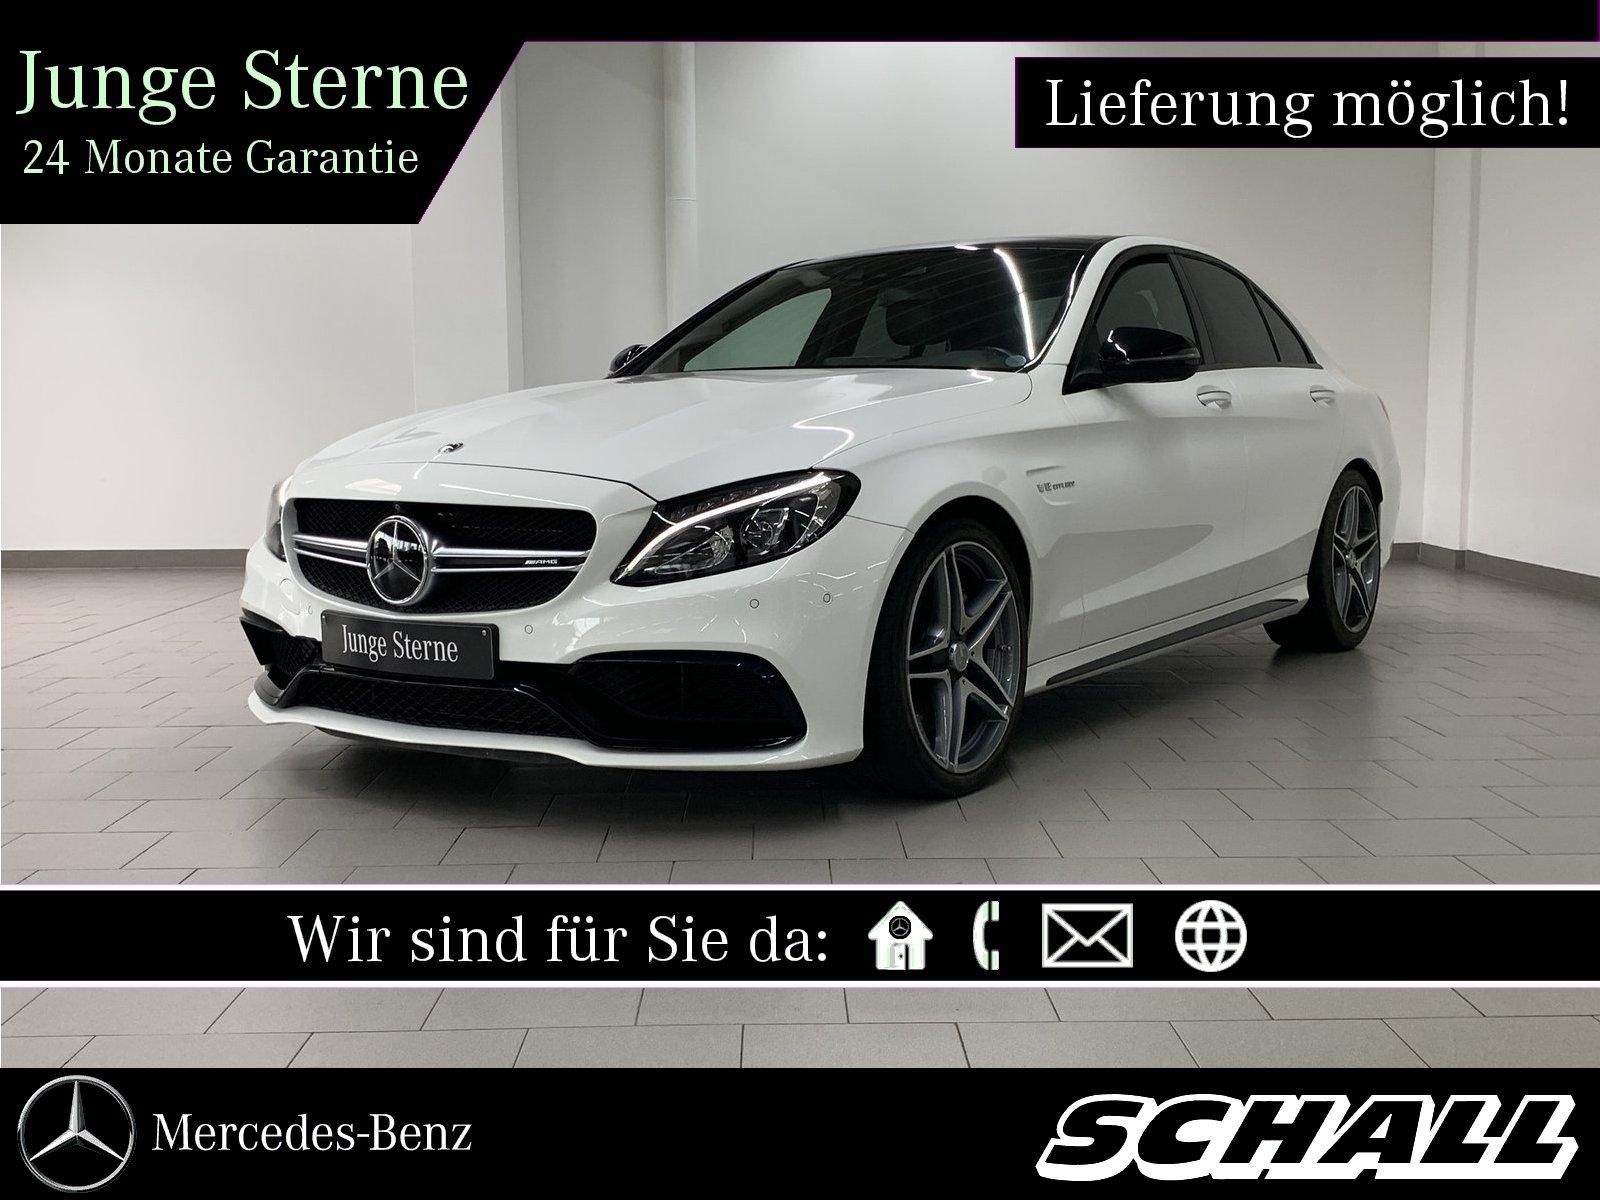 Mercedes-Benz C 63 AMG PERF.ABGASANL+NIGHT+DISTR+PANO+360°+LED, Jahr 2017, Benzin